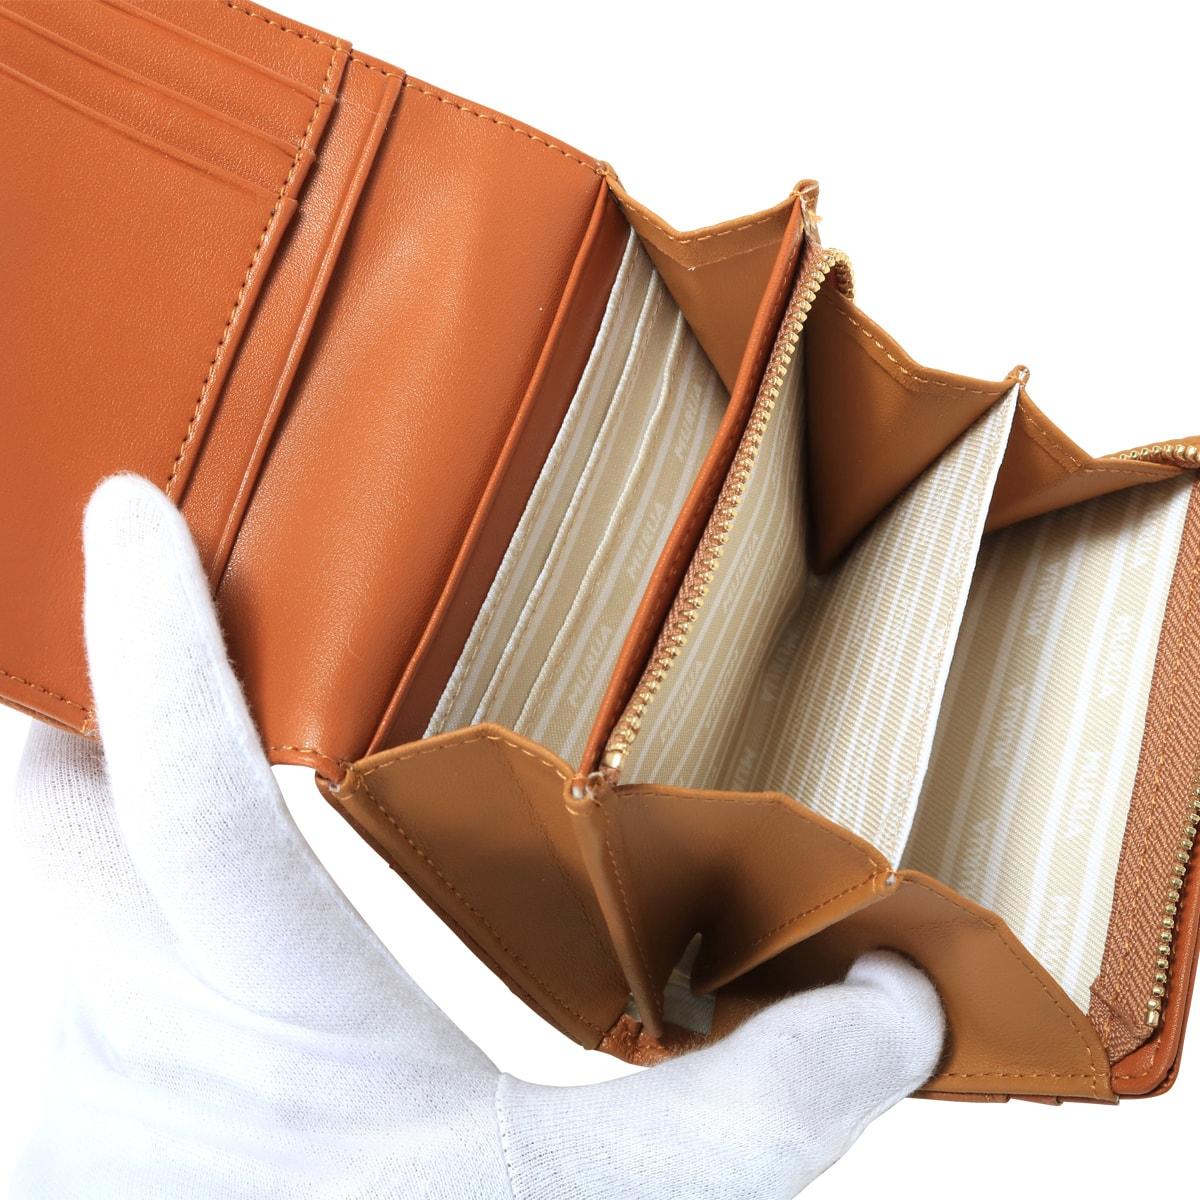 buy popular 1833f 5aa77 bef] キルティング ブランド専用BOX付き 二つ折り財布 ...